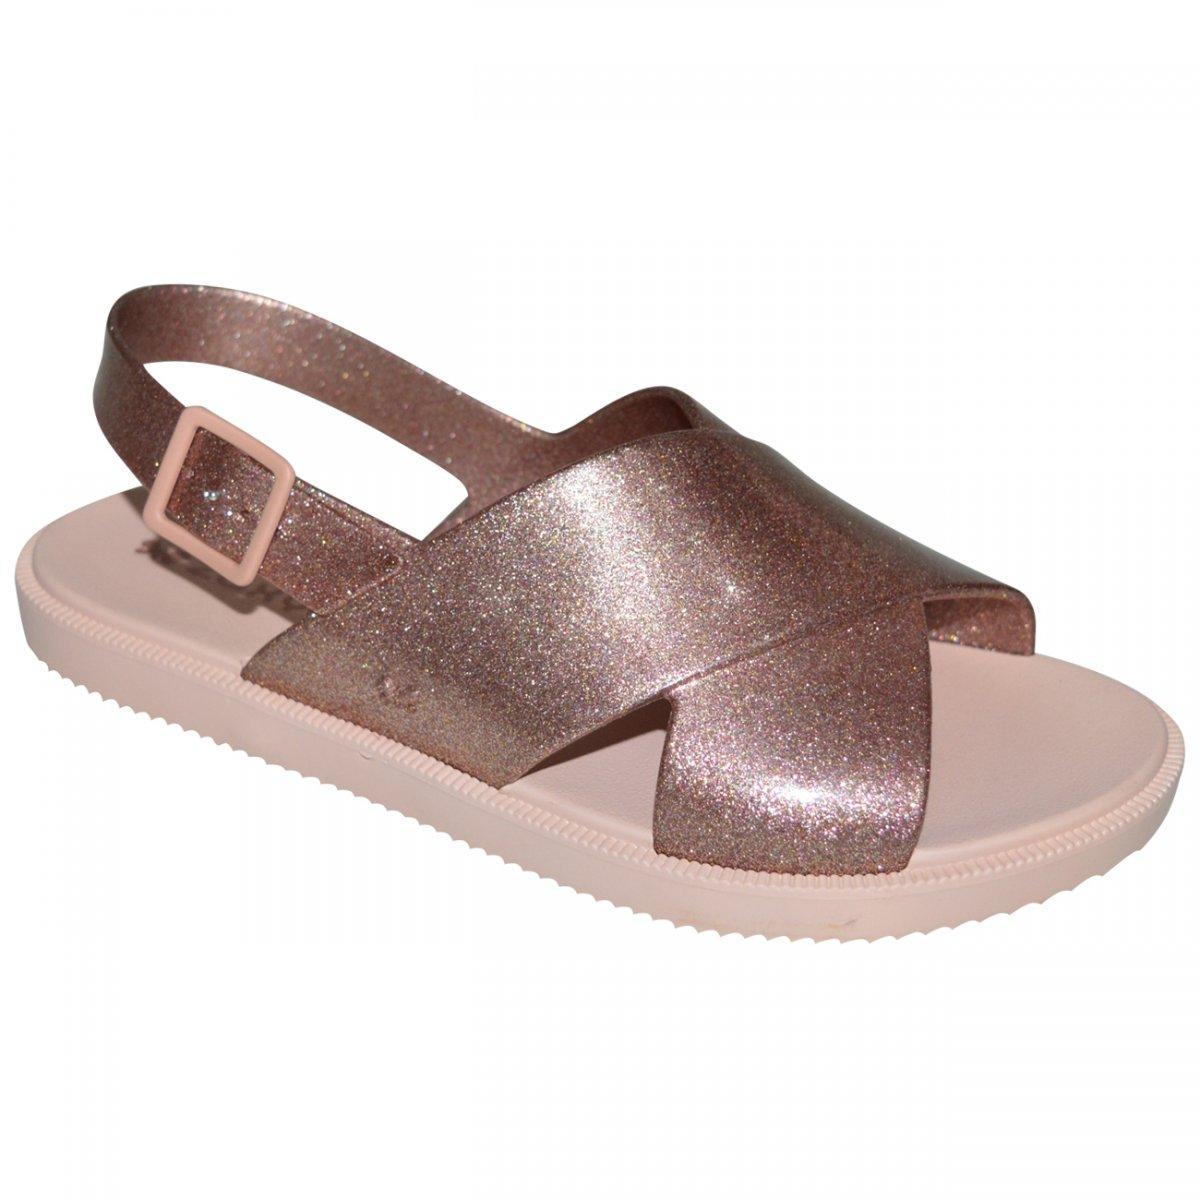 9255e371c1 comprar sandália da Zaxy Match